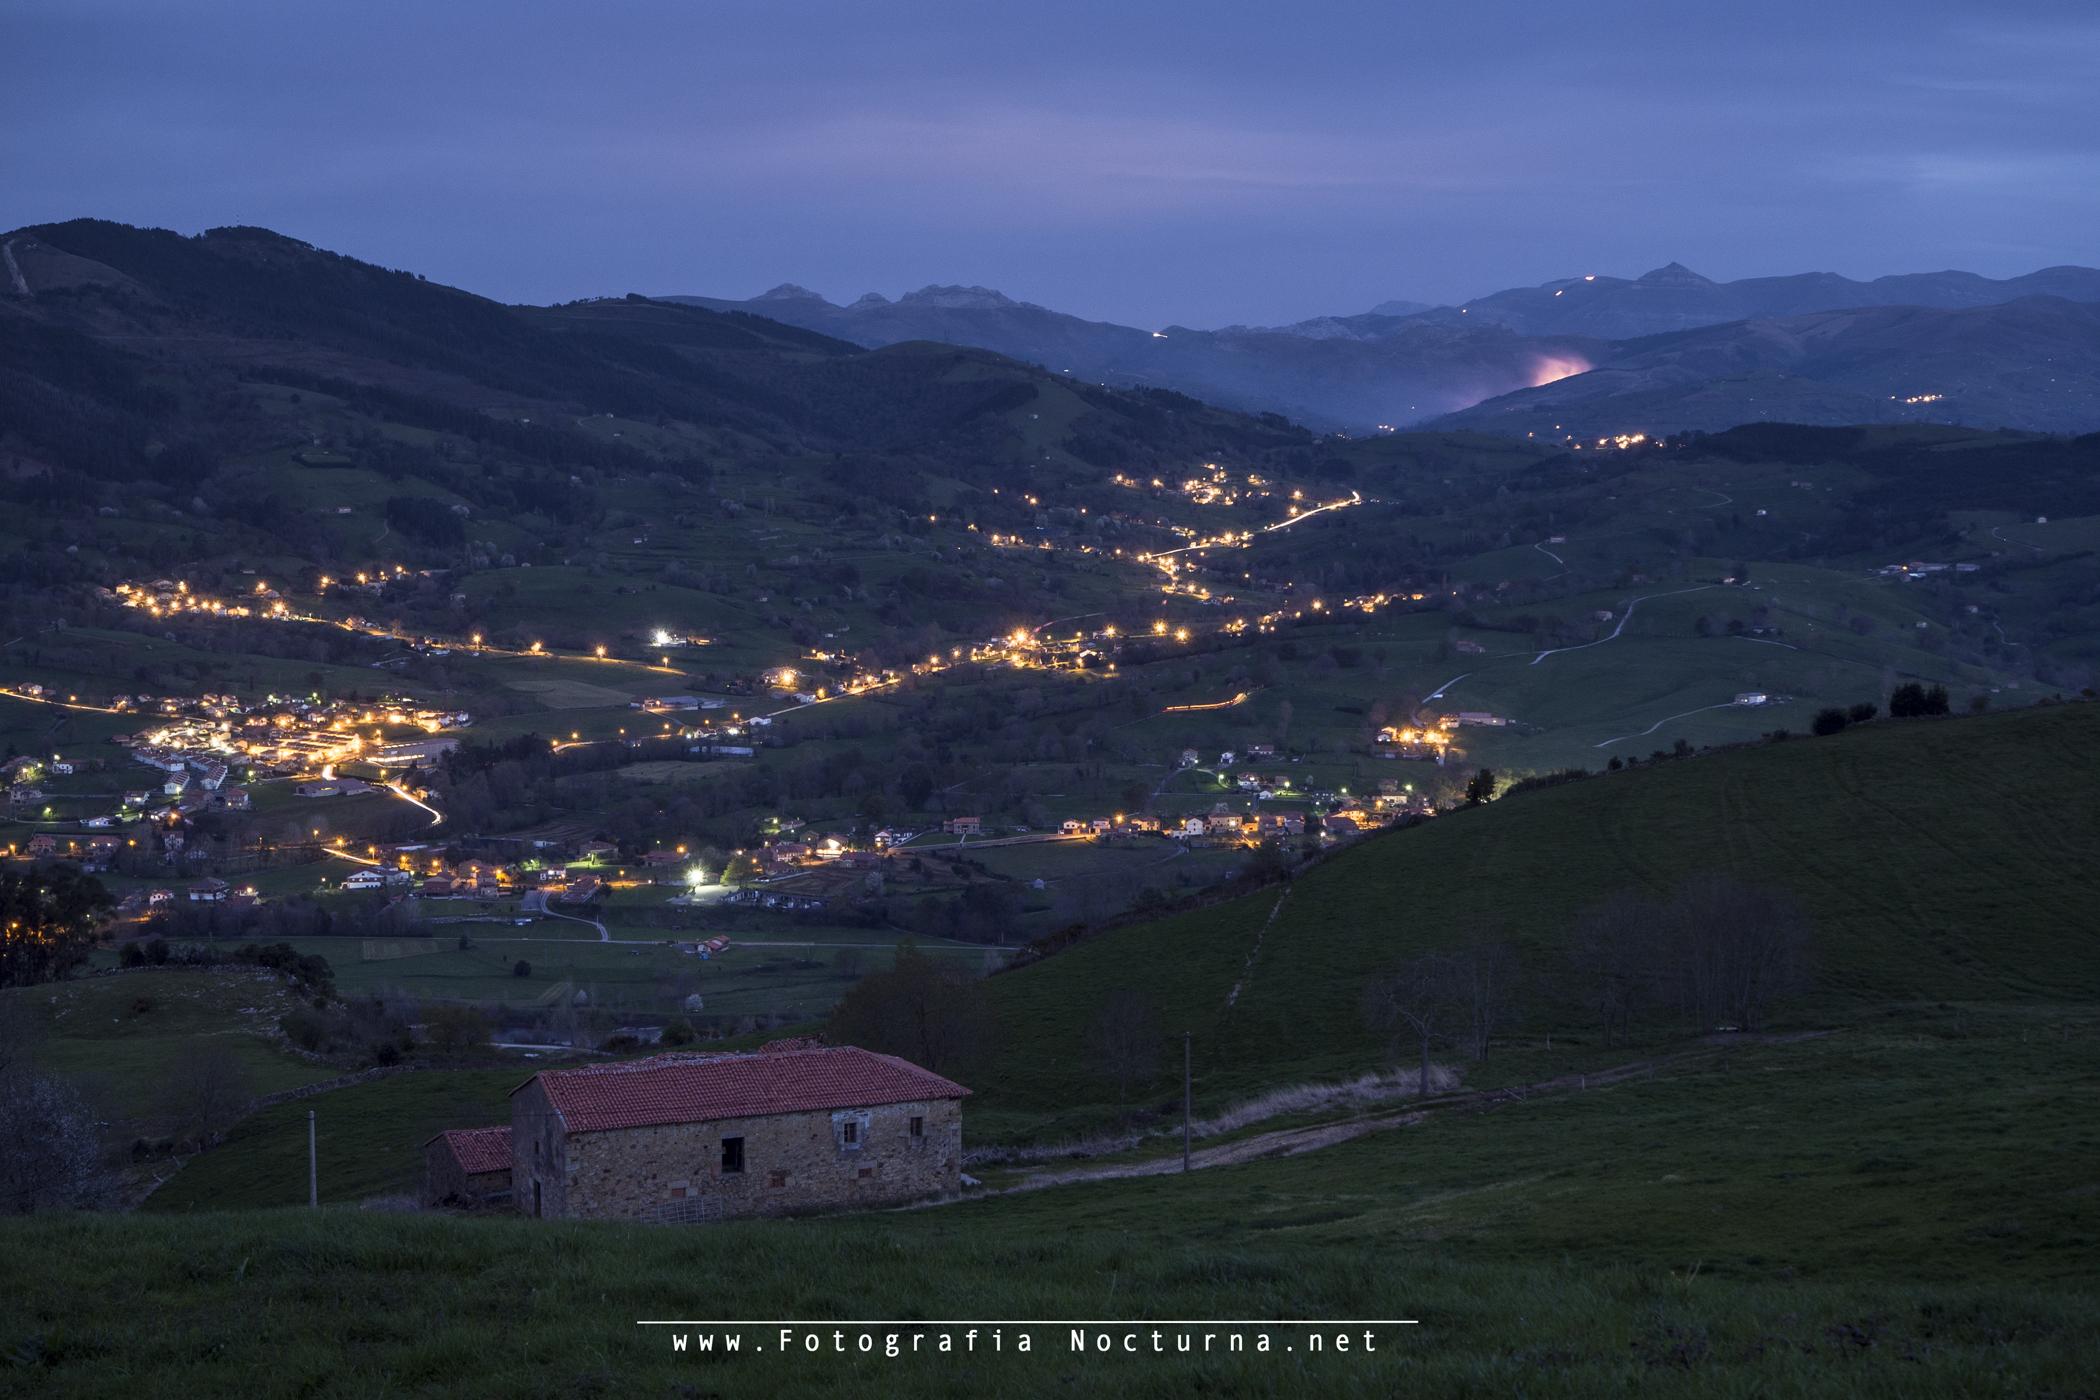 Valle de Toranzo